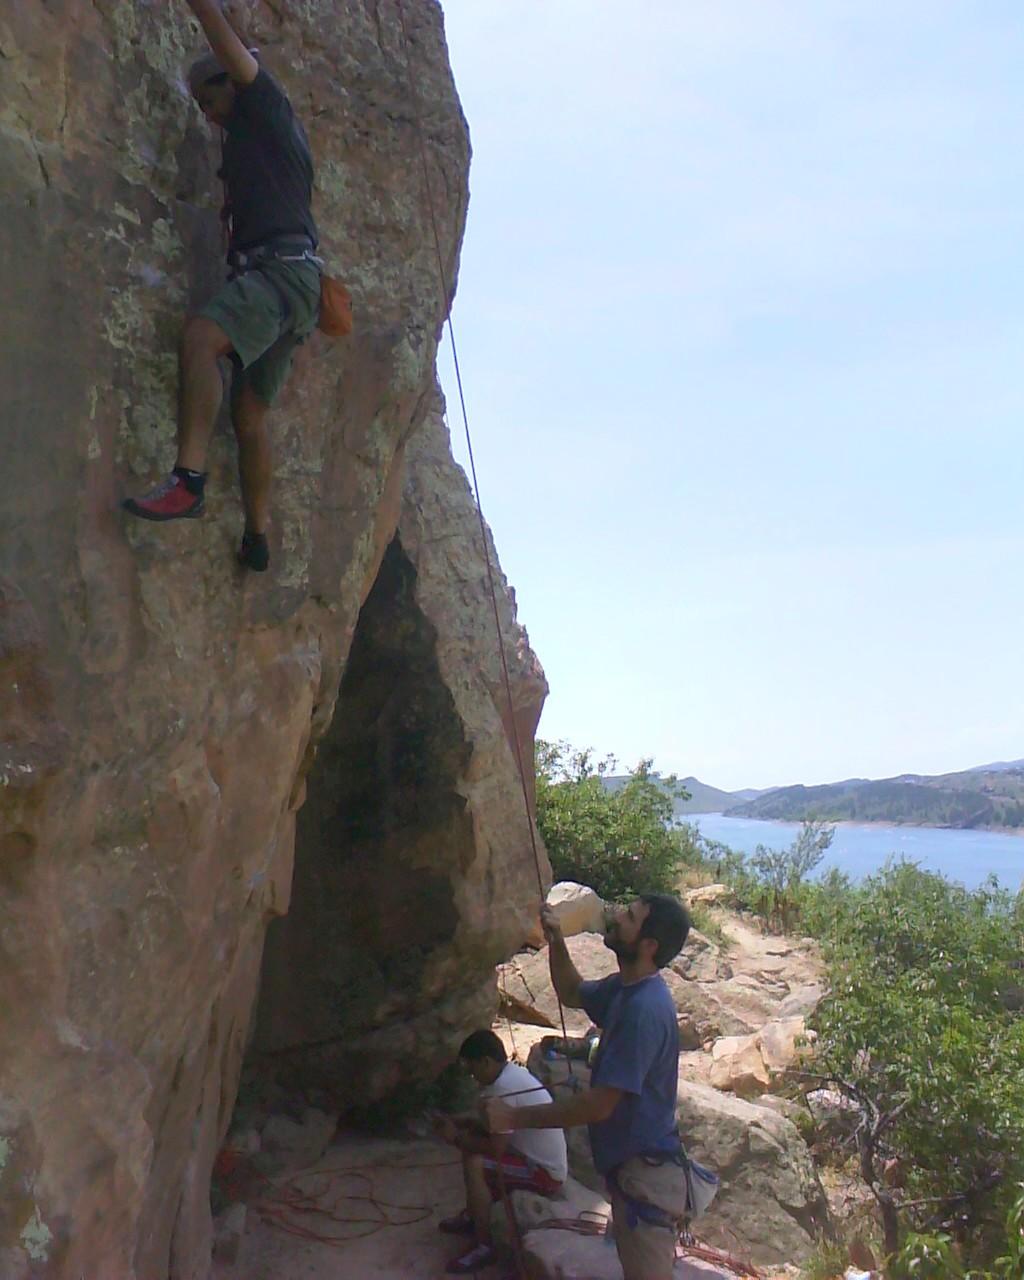 Raphael Gay, Mehdi Partou, 5.10 climb, Rotary Park